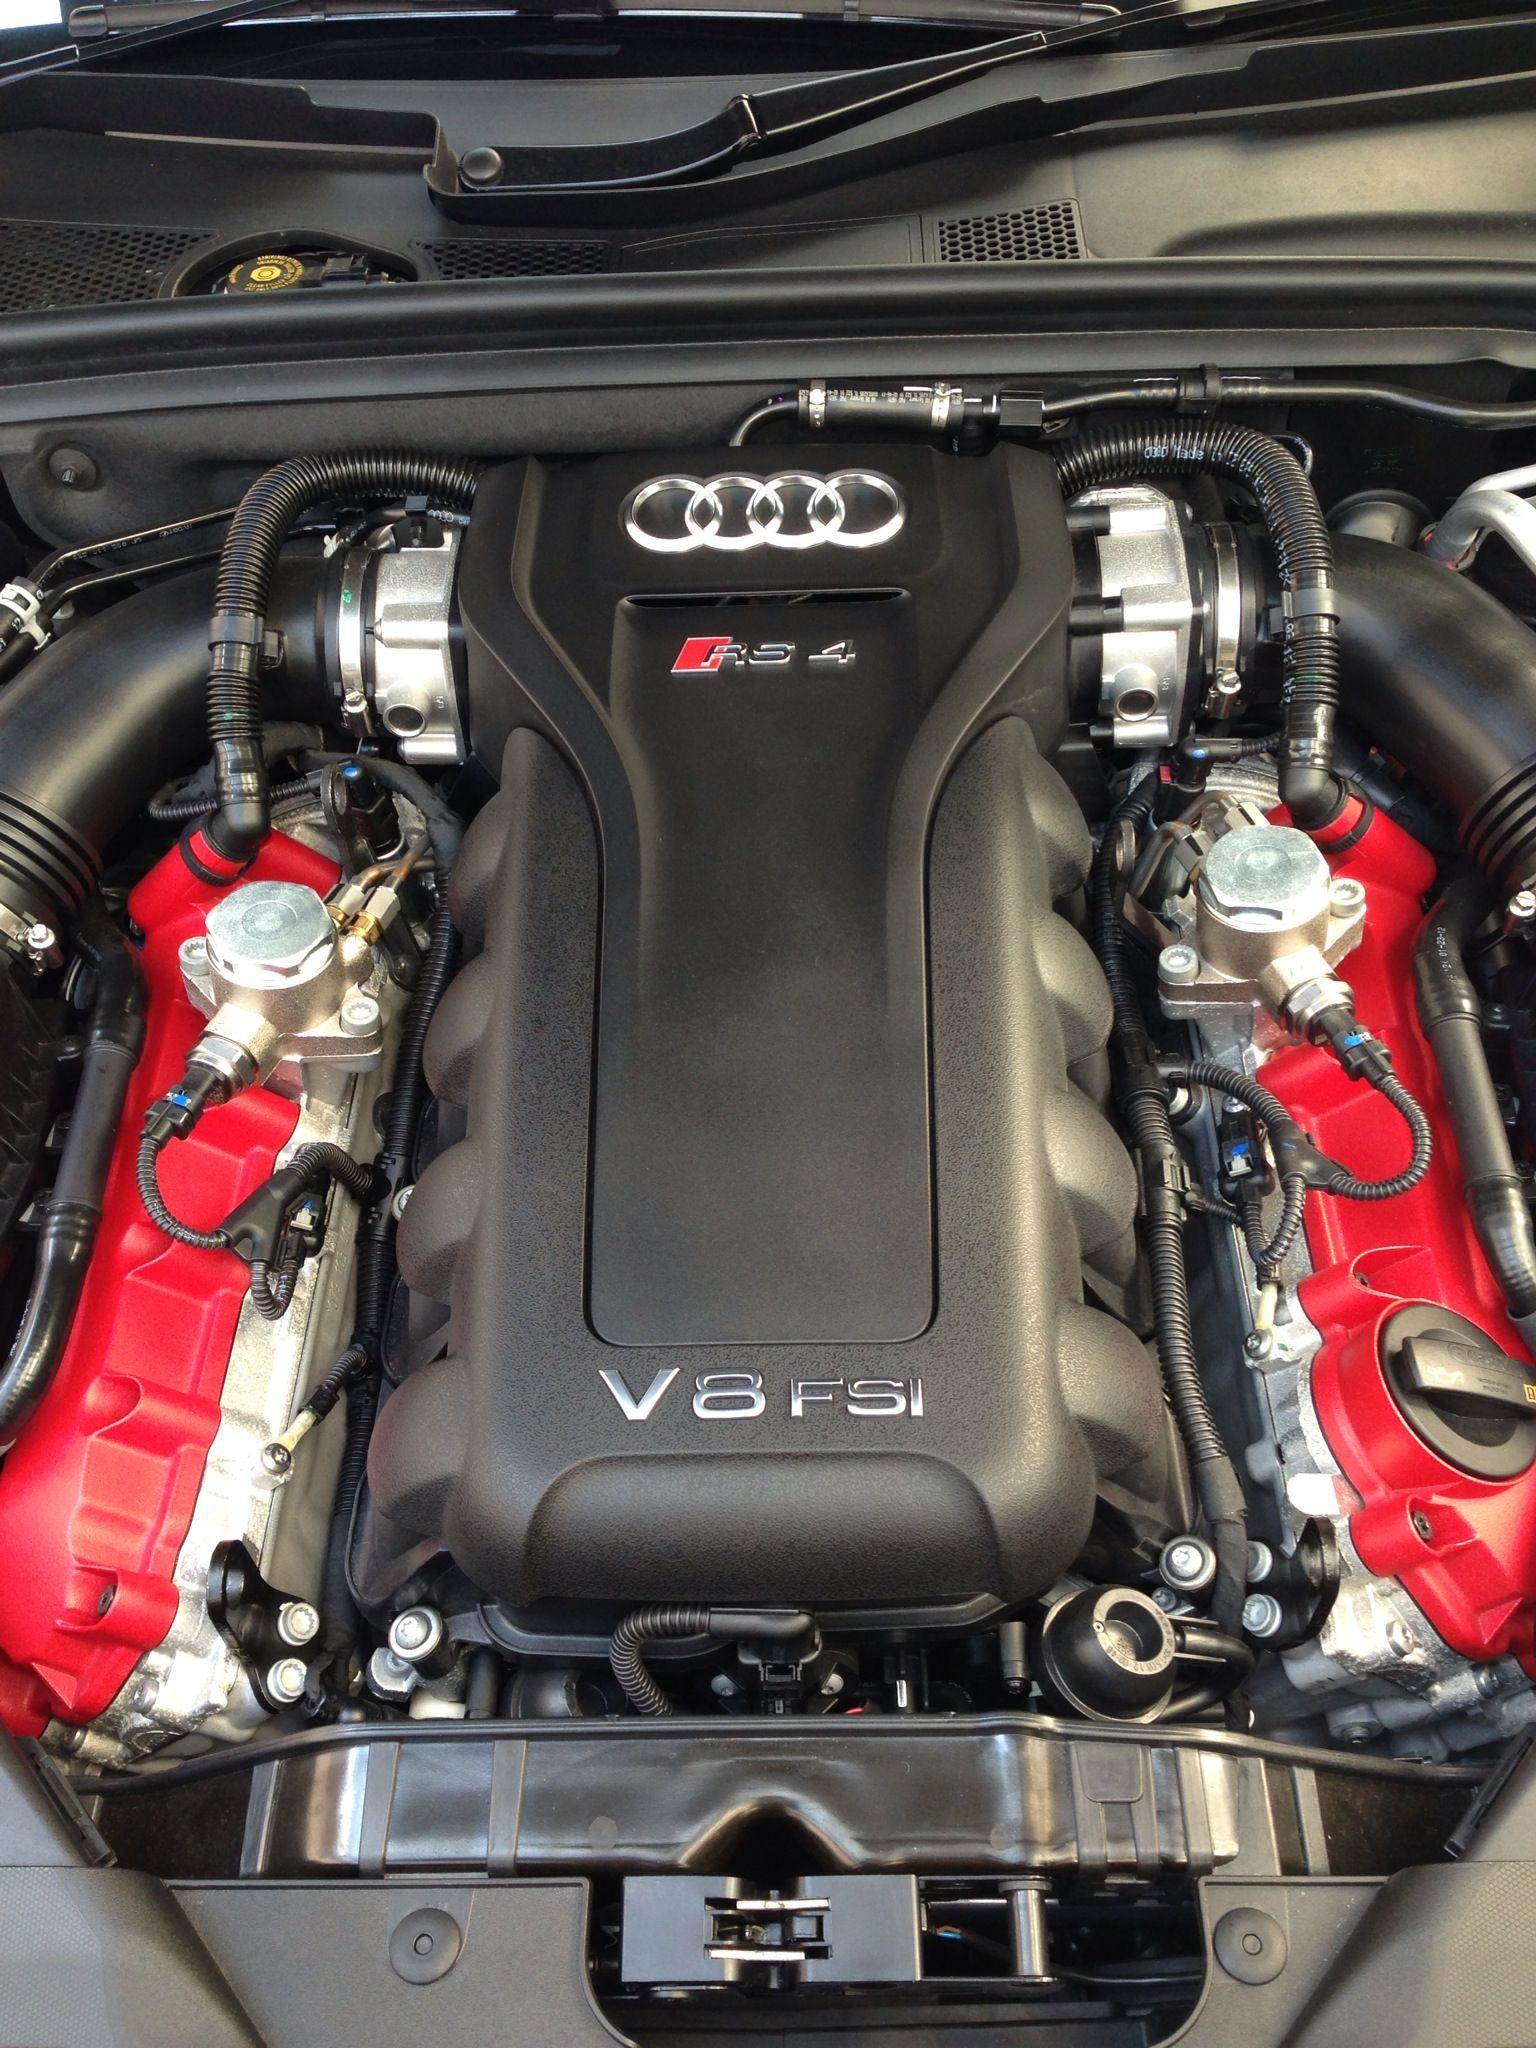 New Audi Rs4 4 2 V8 Engine Audi Motorsport Audi Rs4 Audi